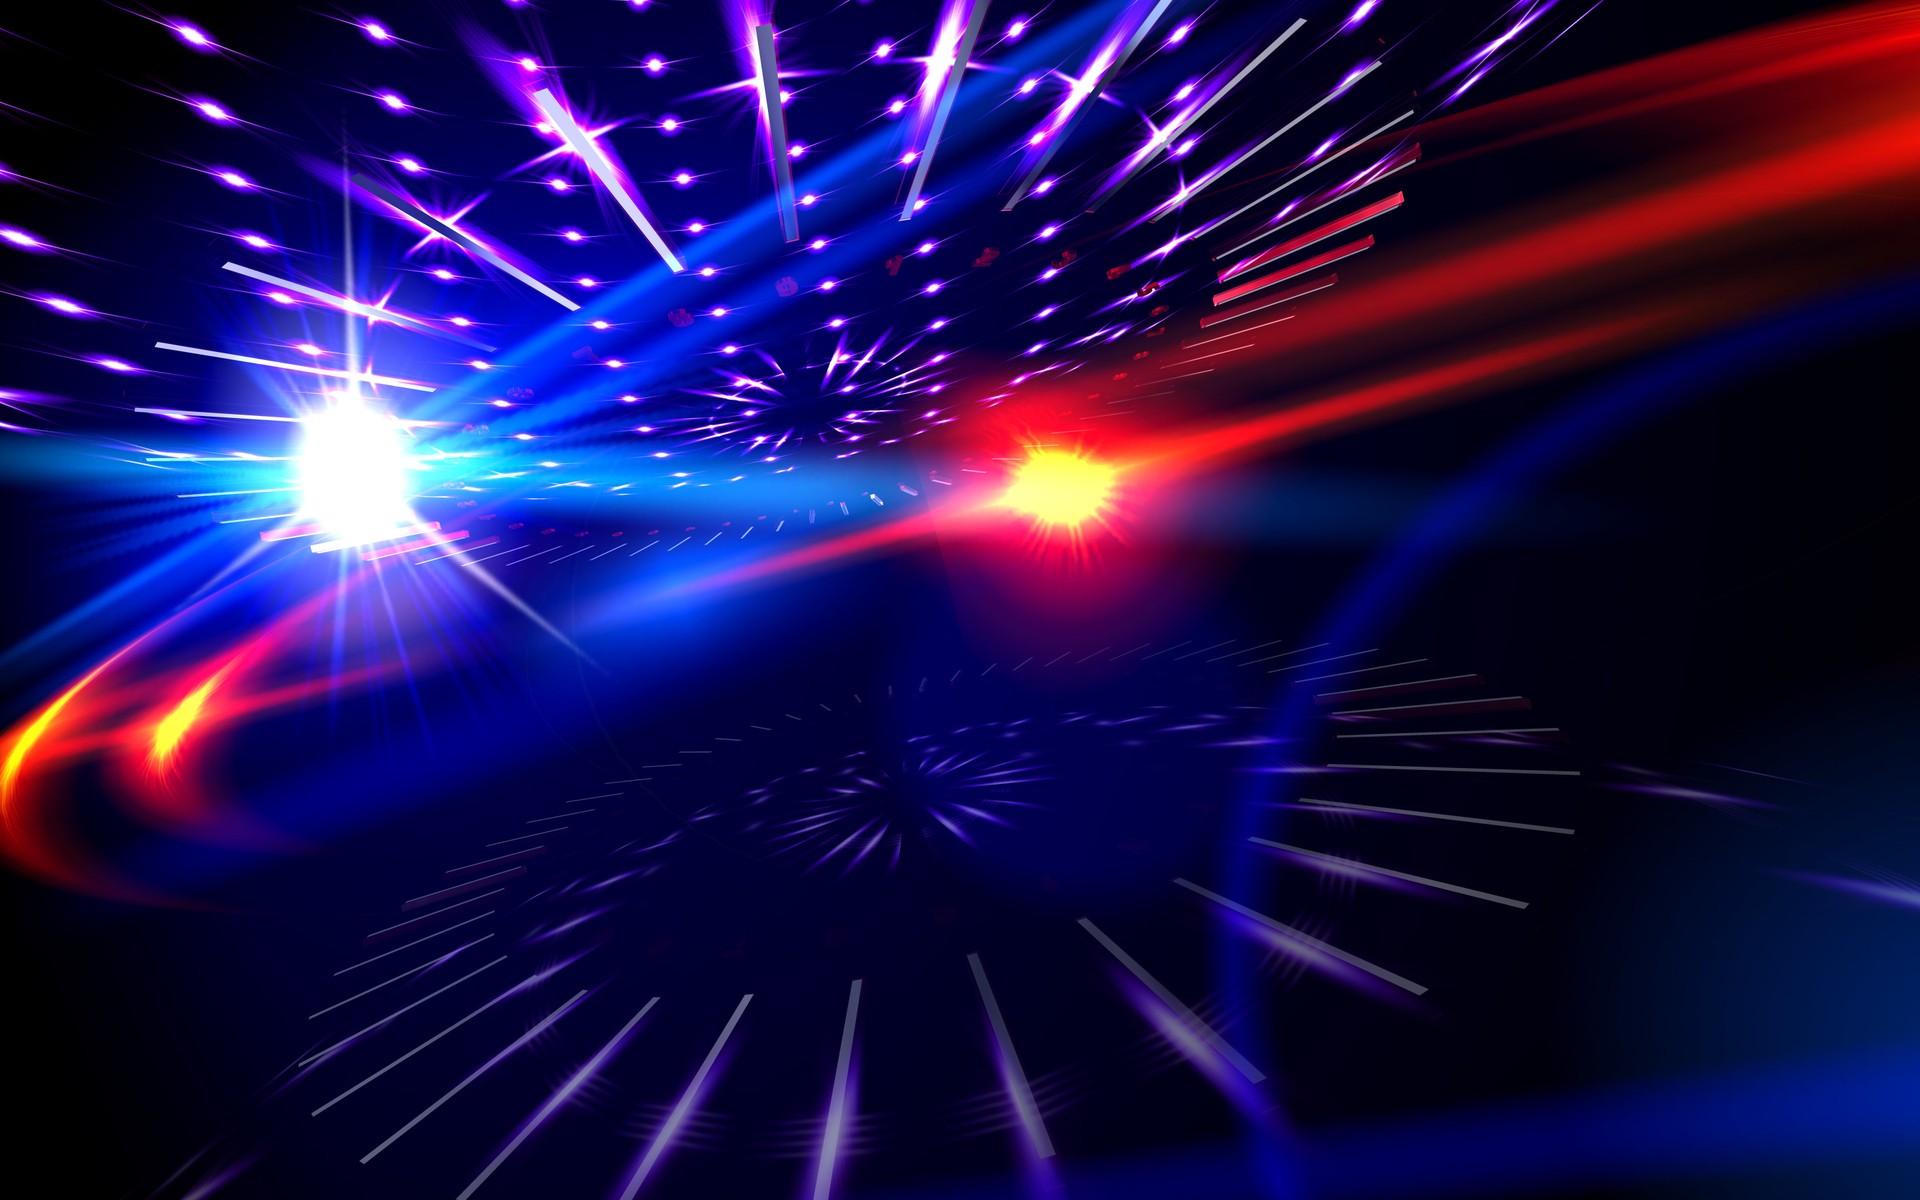 Disco Lights Desktop - Free downloads ... - download.cnet.com